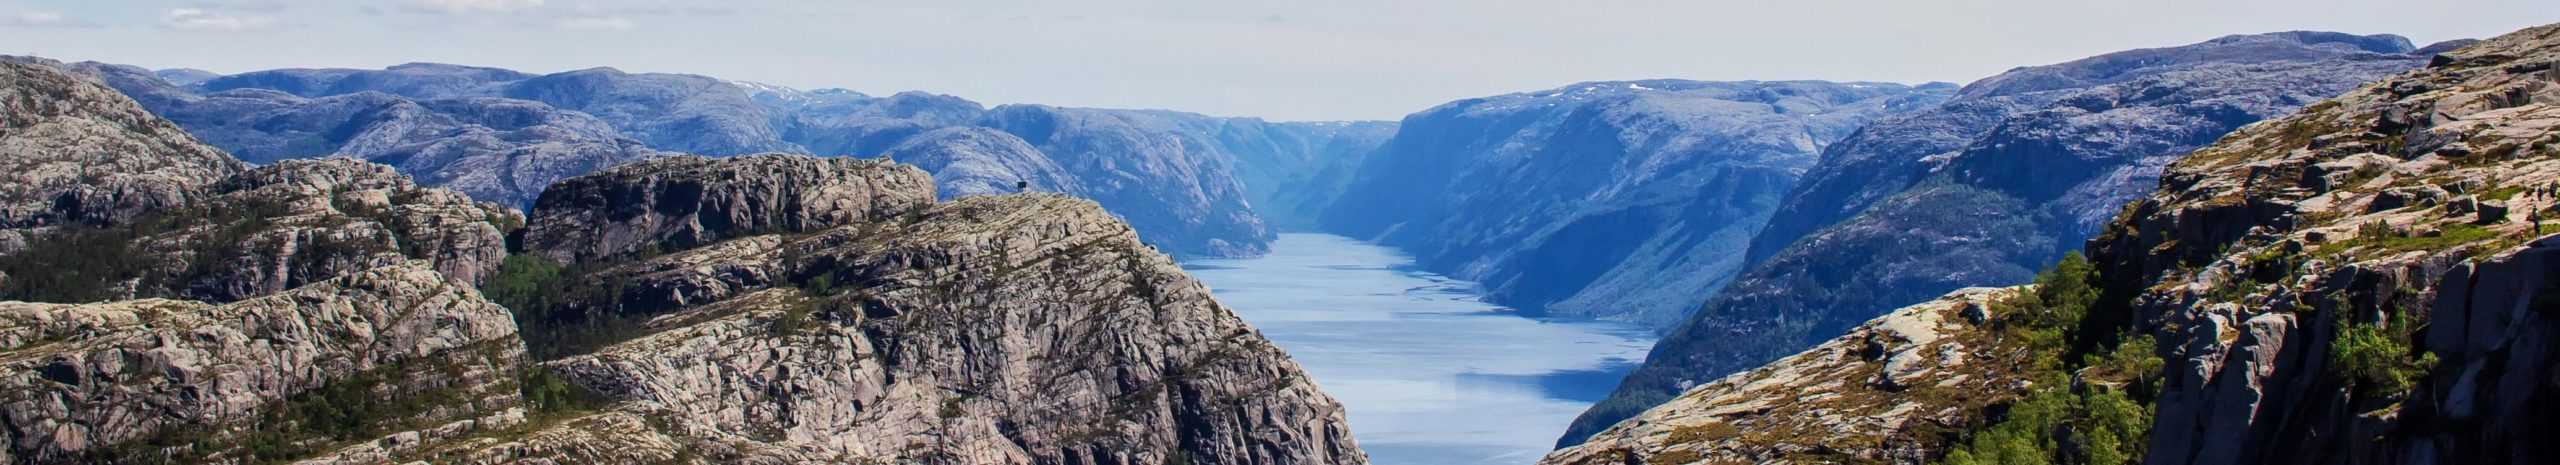 Супер цена на круиз по Норвежским фьордам!<br> MSC Meraviglia (MSC Cruises)